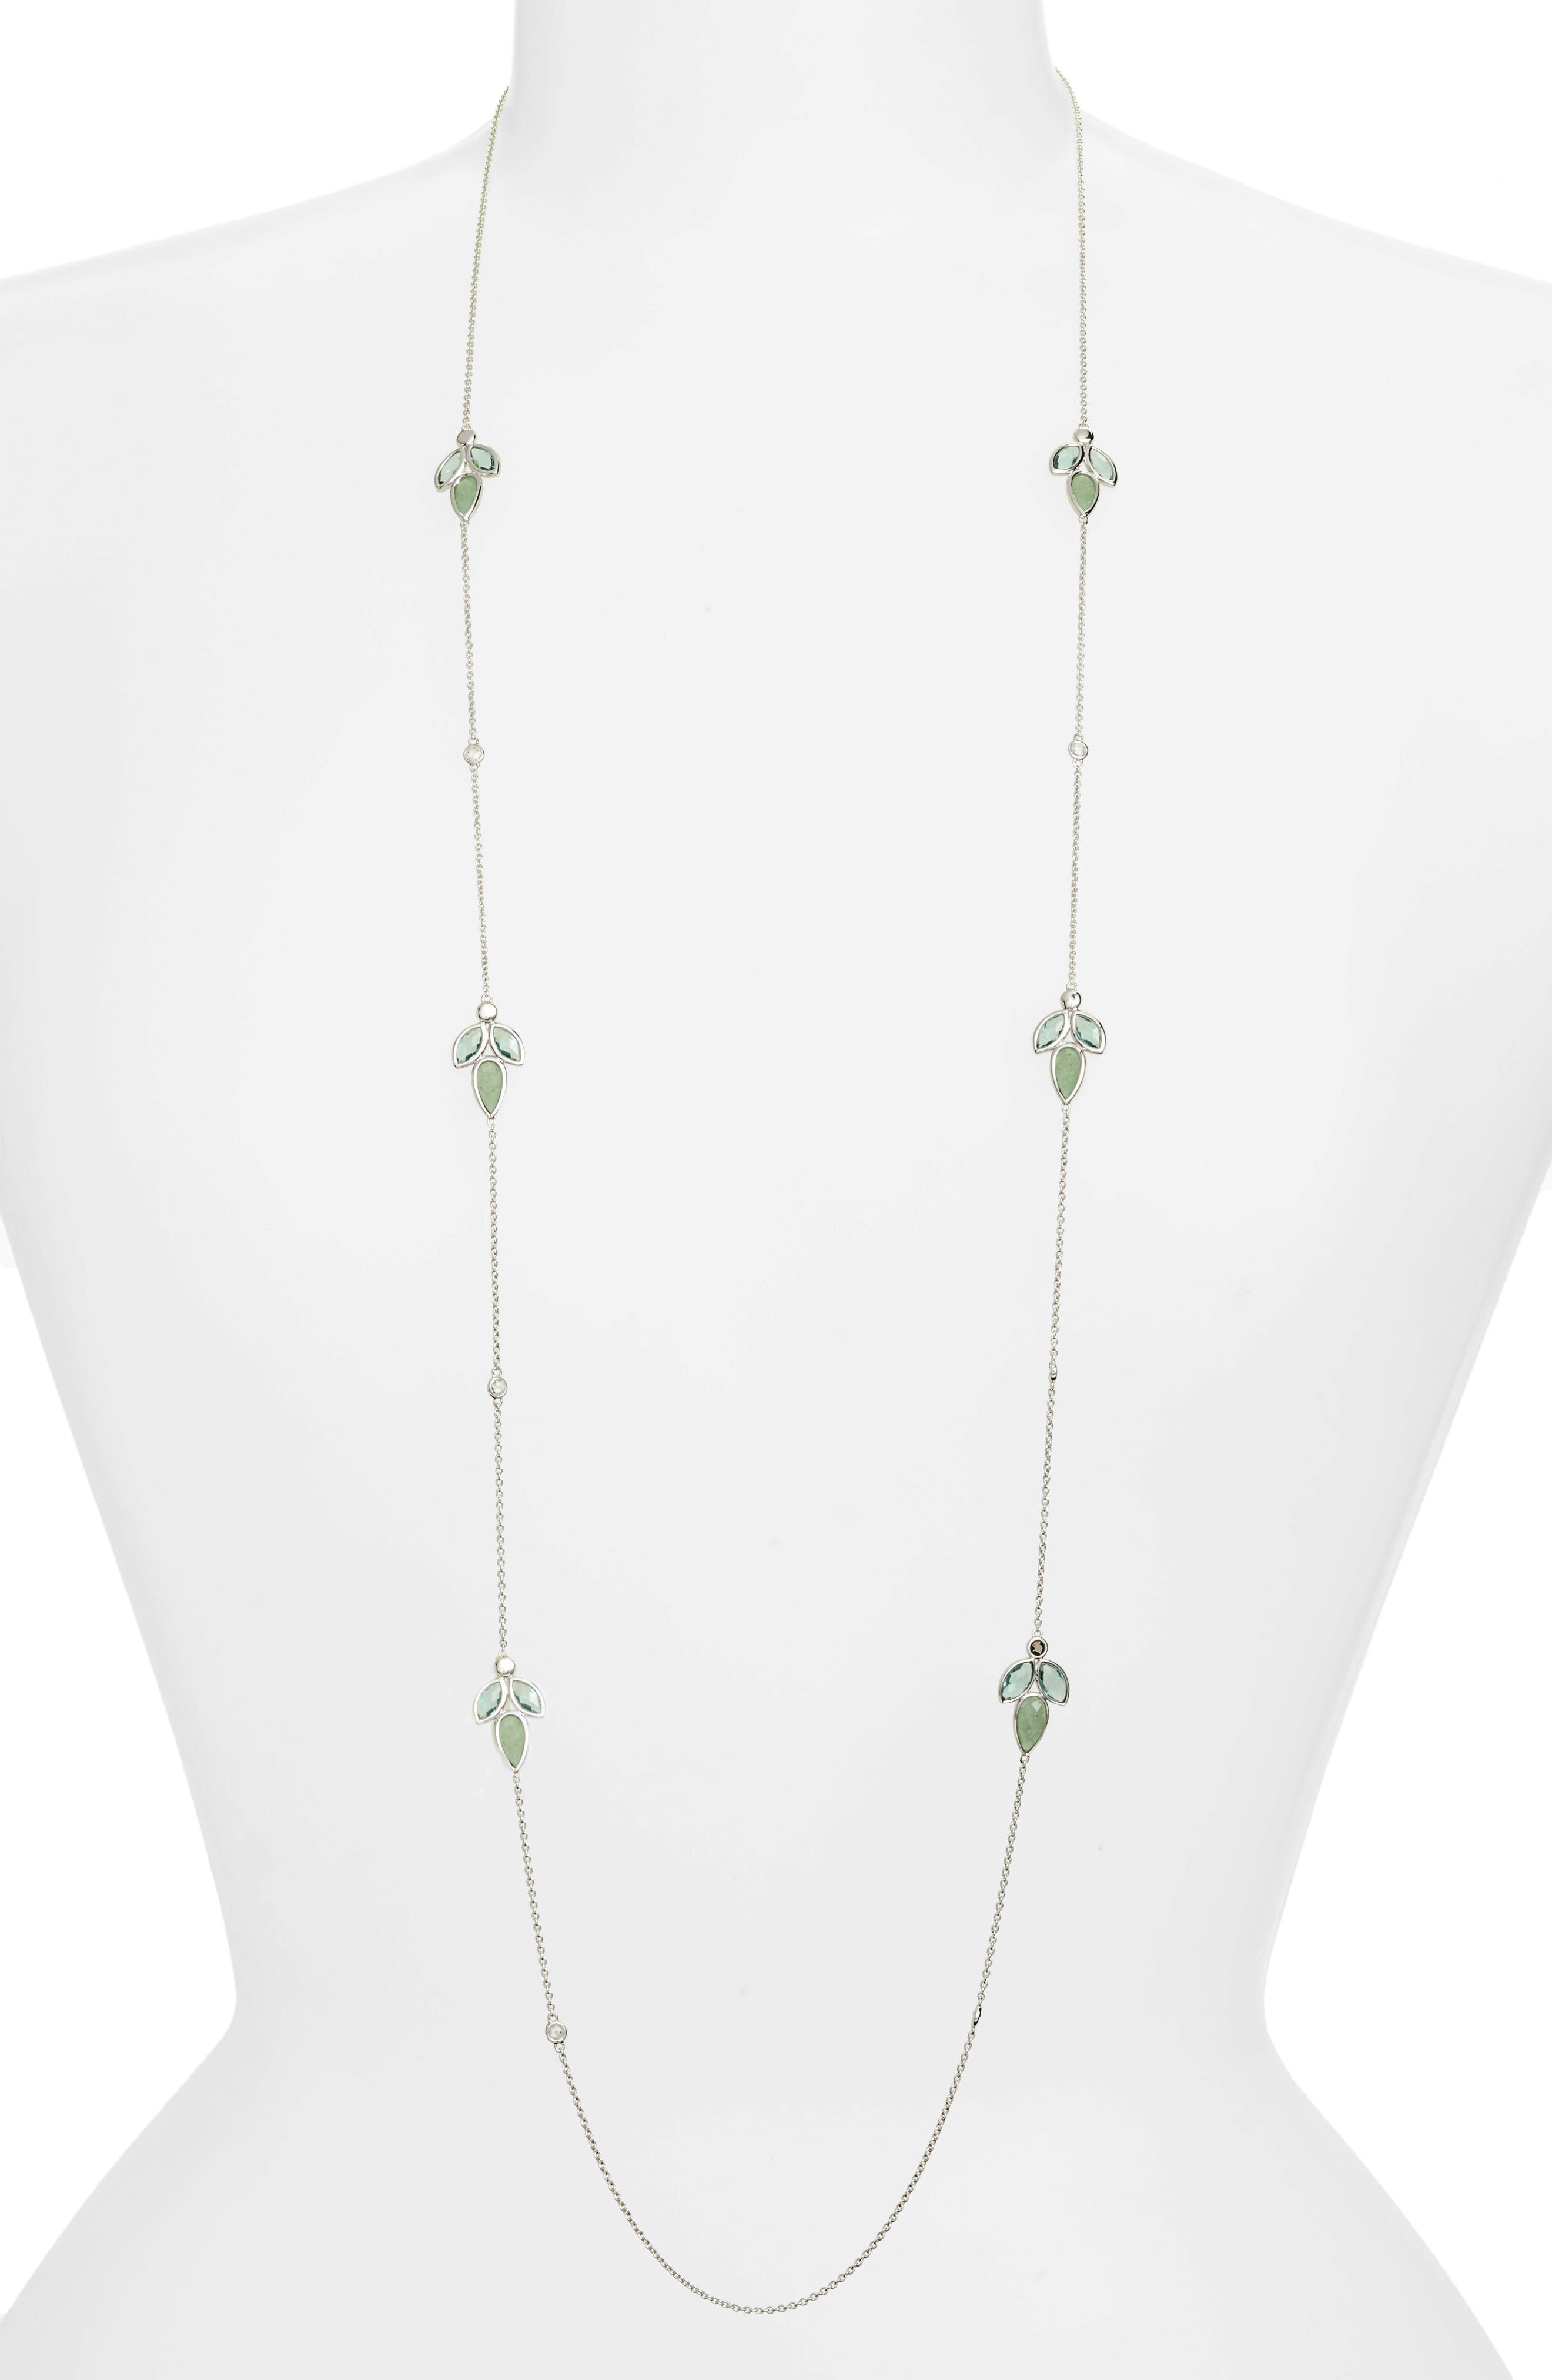 Lakeside Station Necklace,                             Main thumbnail 1, color,                             Green/ Black Diamond